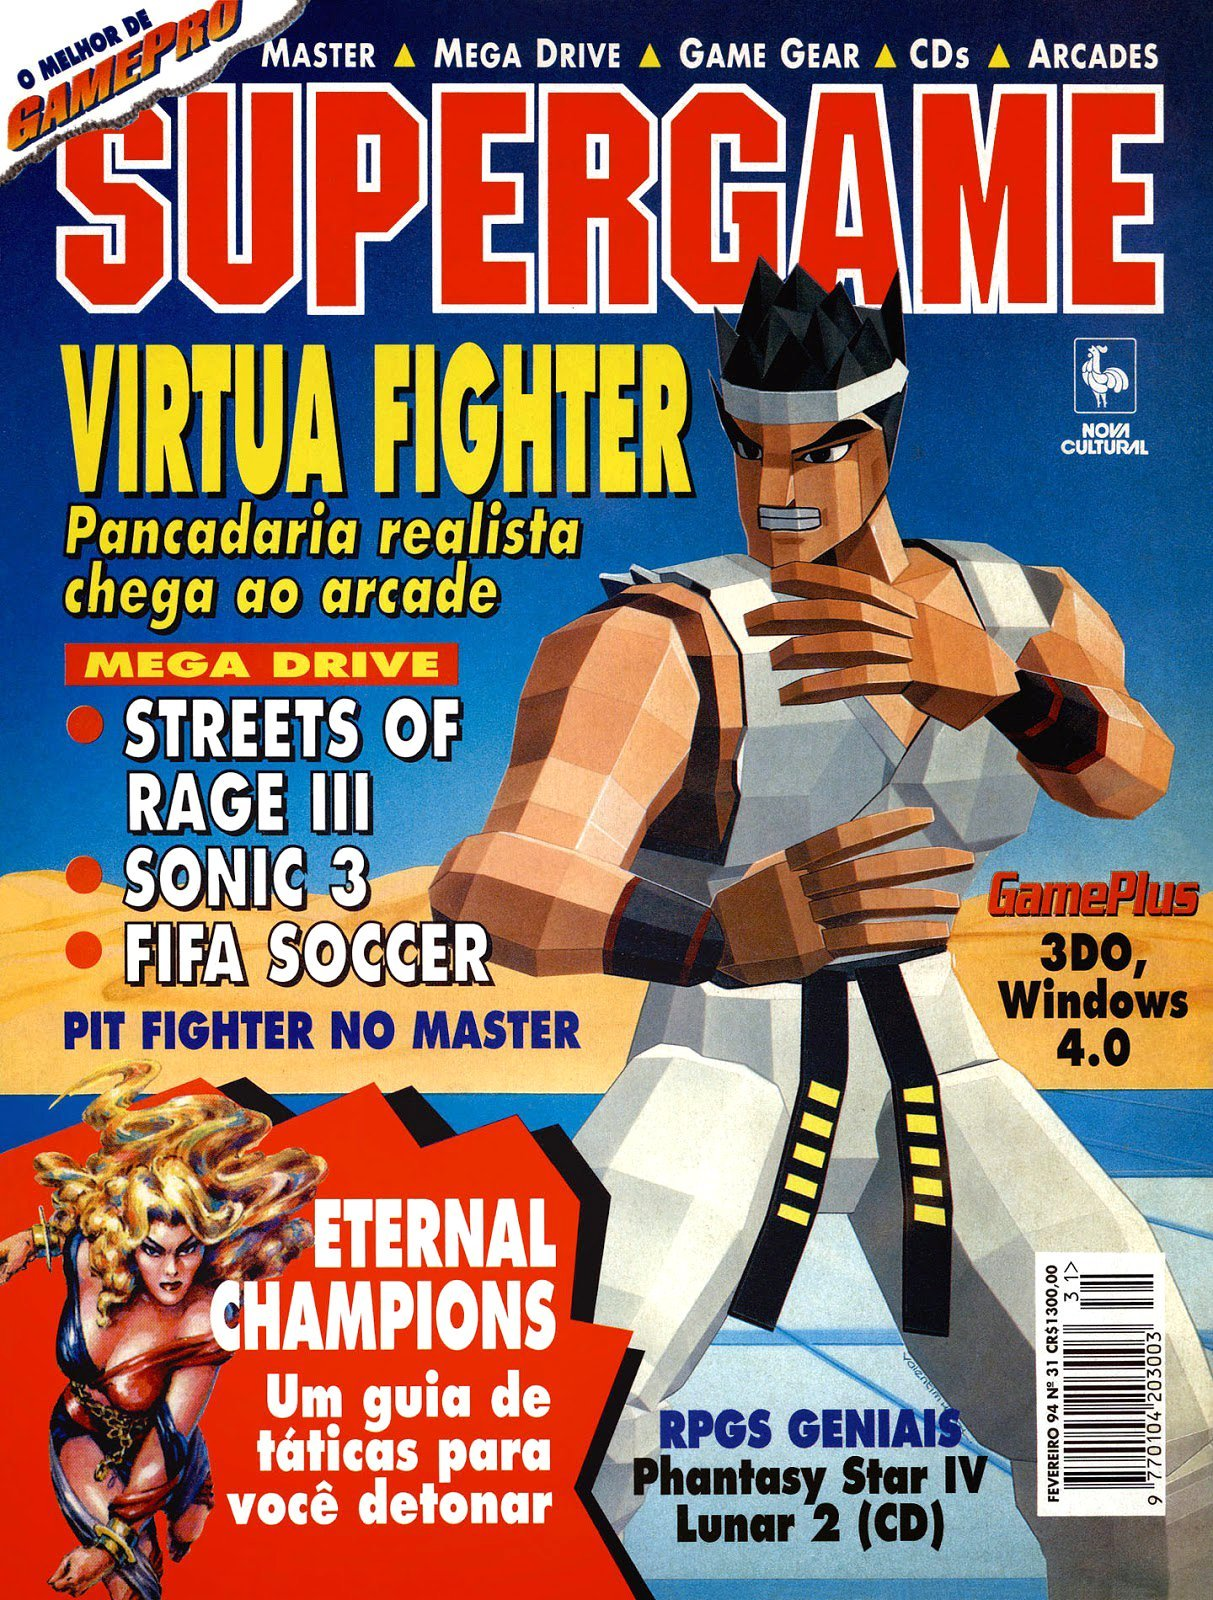 SuperGame 31 (February 1994)